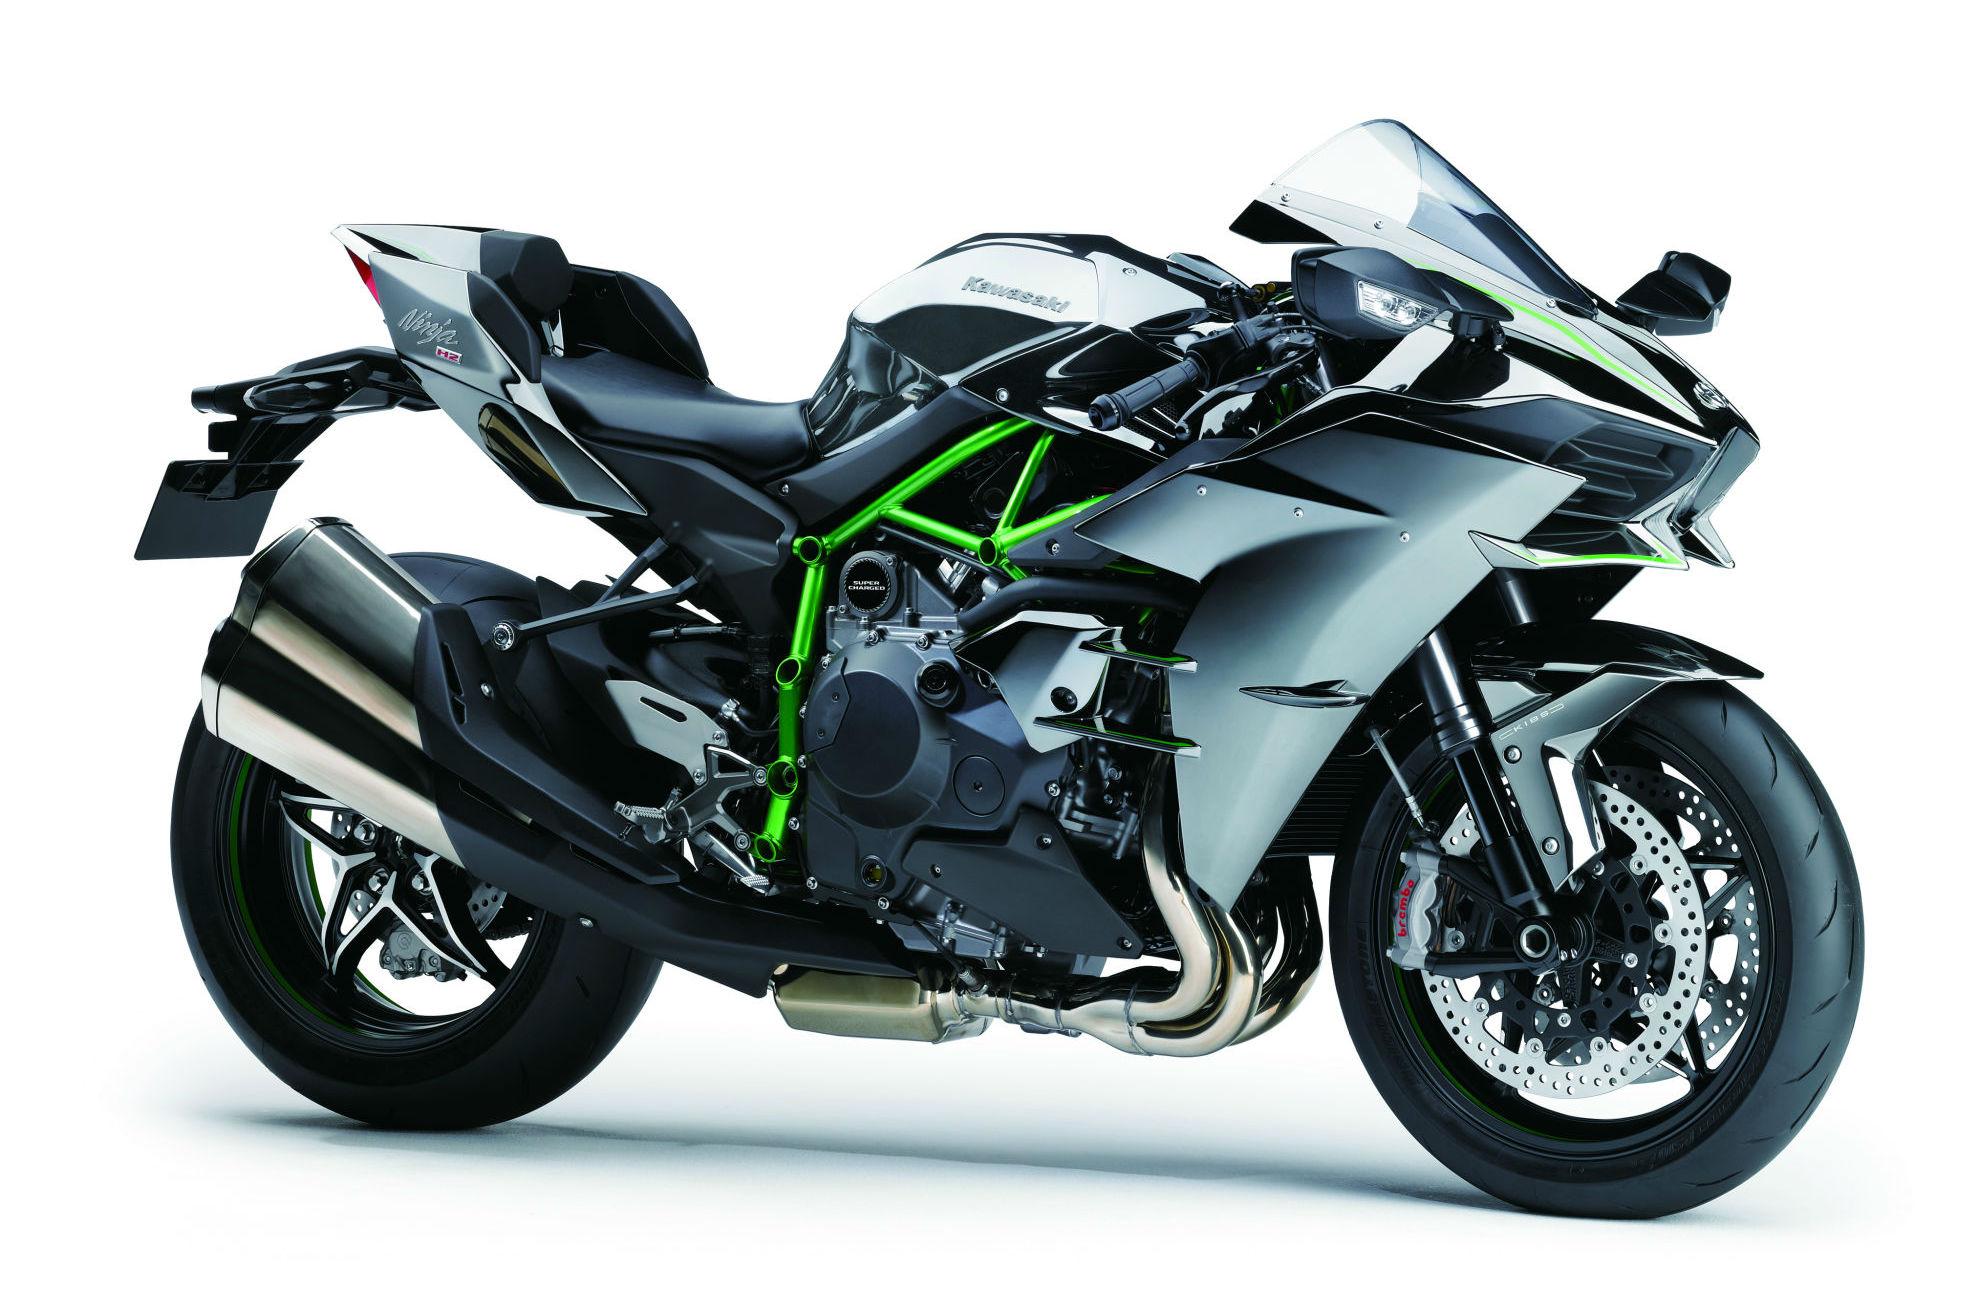 Kawasaki Ninja H2 price announced in US | Visordown